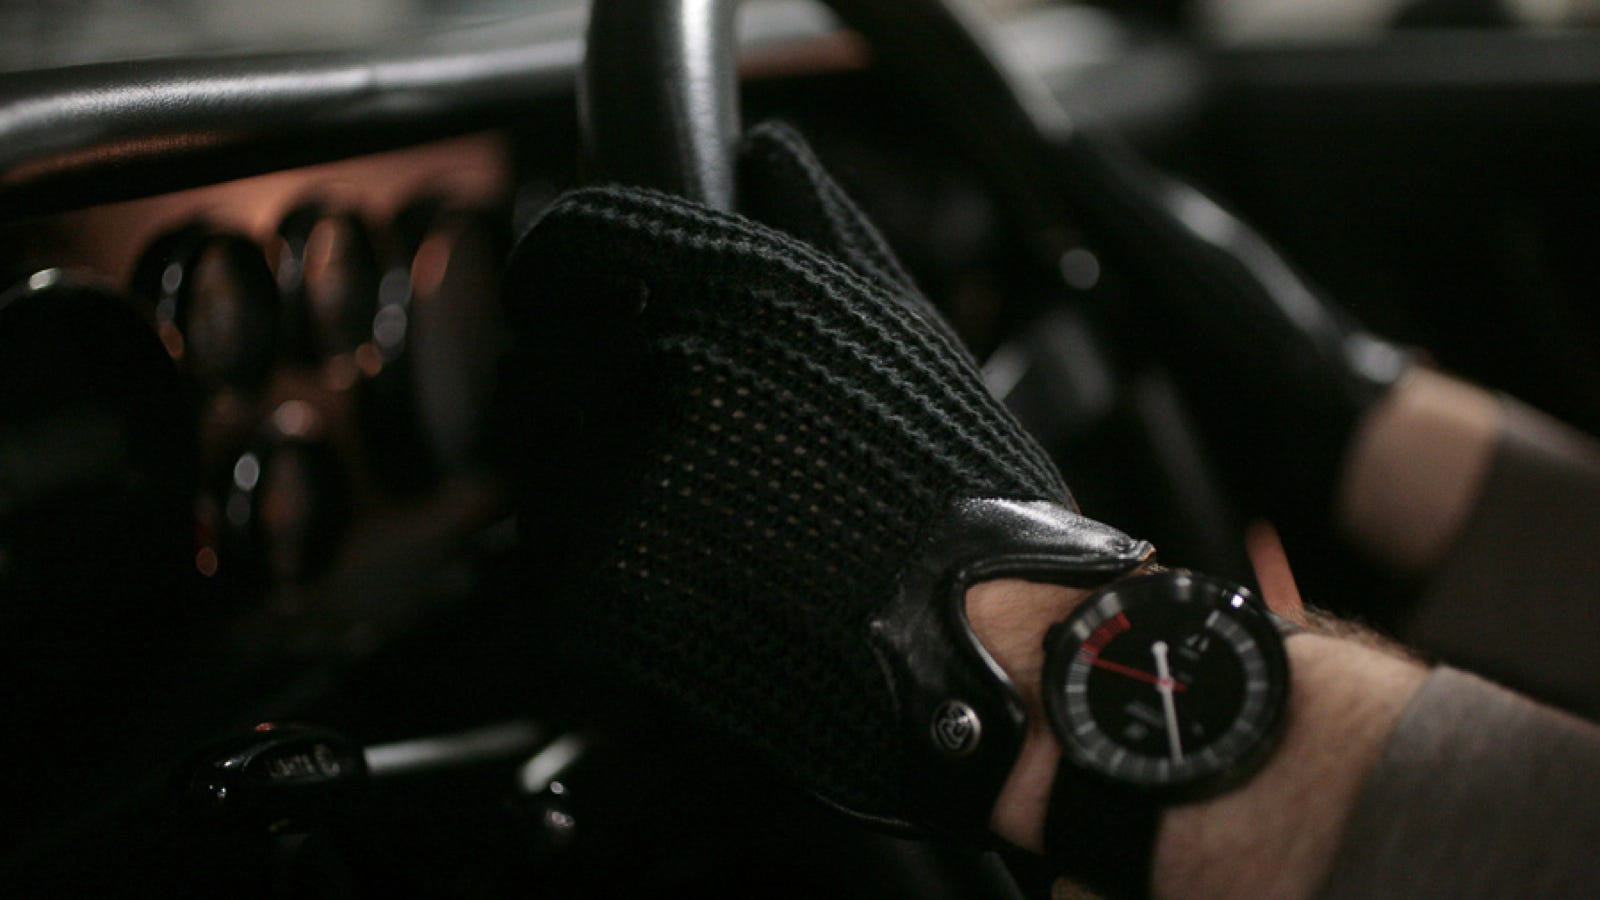 Driving gloves jalopnik - Driving Gloves Jalopnik 1